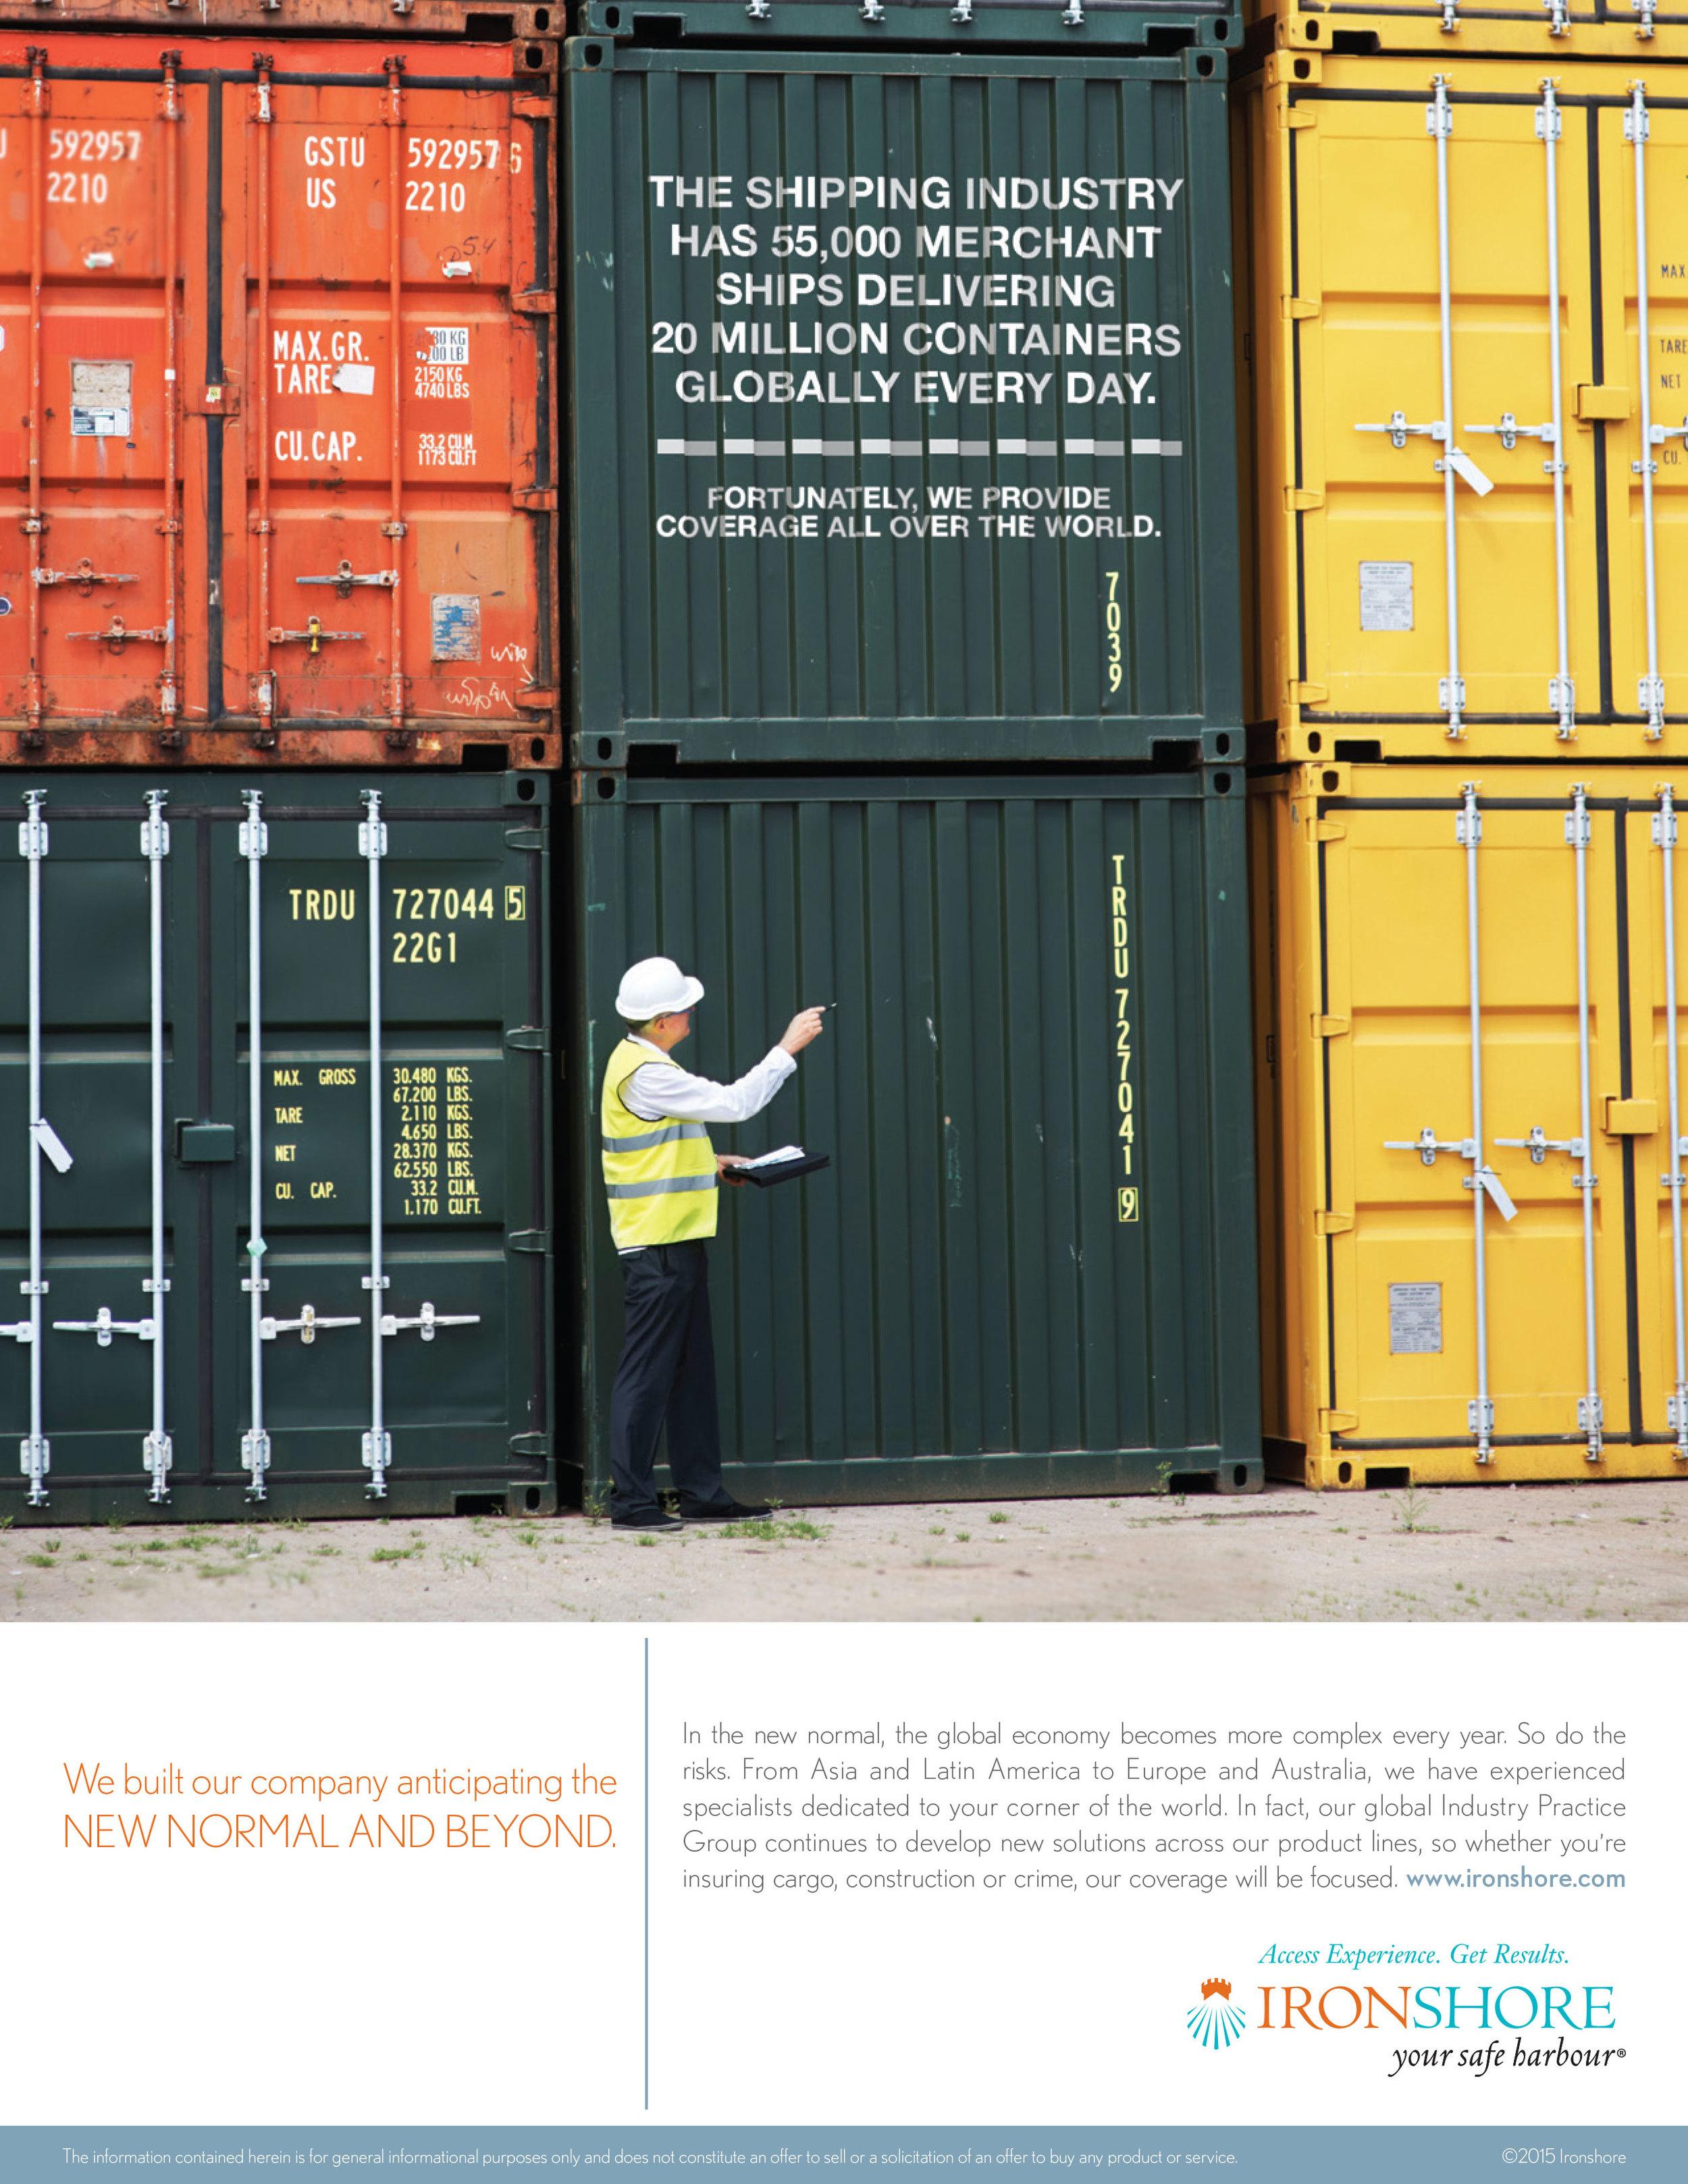 ironshore-insurance-advertising-shipping-industry.jpg